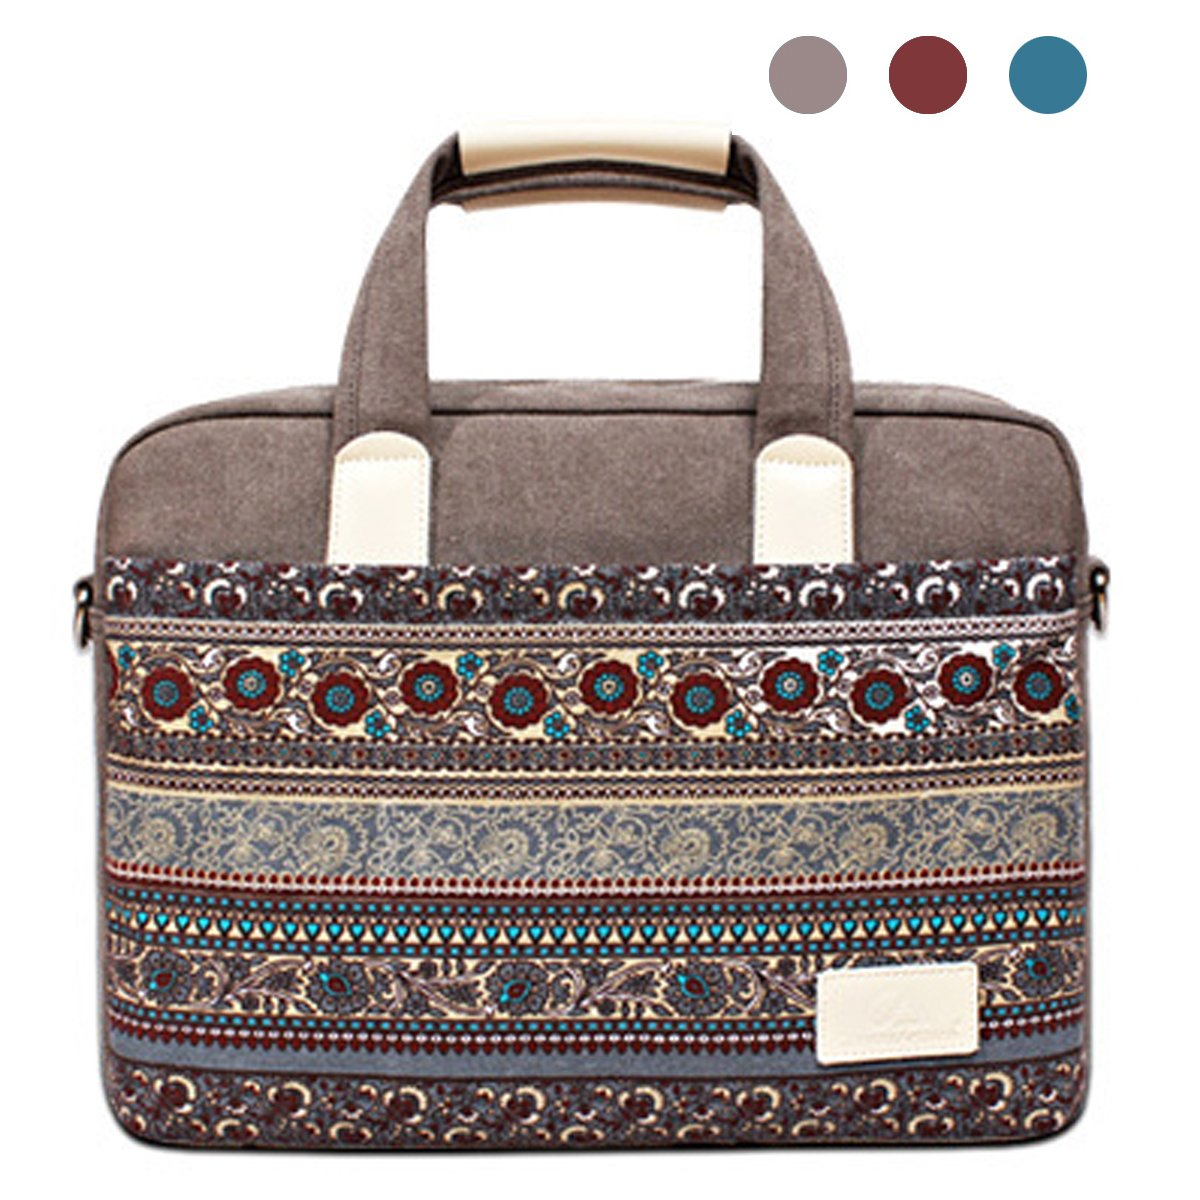 f817c1d62e new YiYiNoe 15.4 inch Canvas Laptop Bag Computer Case Sleeve Shoulder  Messenger Handles Bag Handbag for